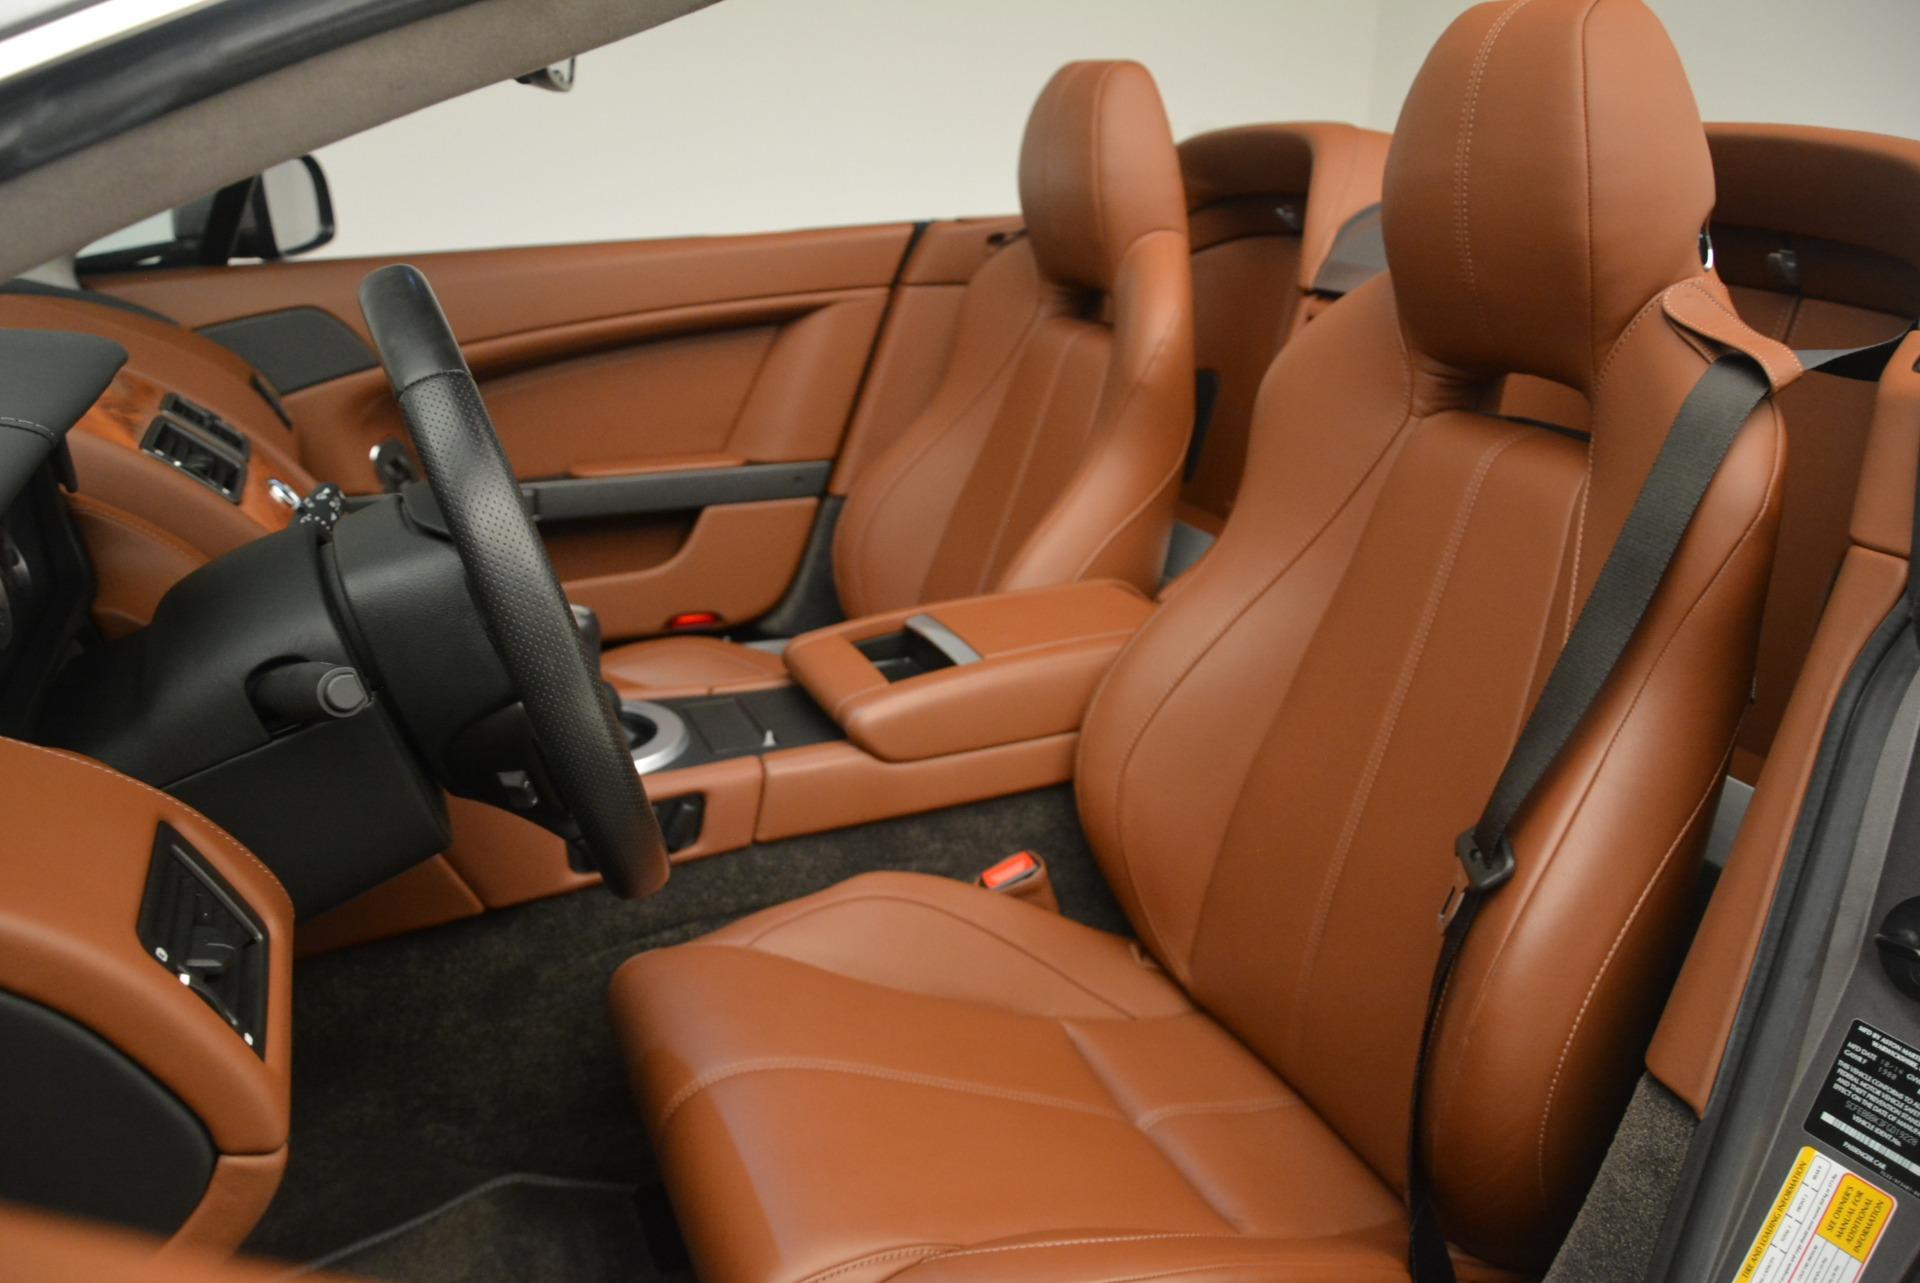 Used 2015 Aston Martin V8 Vantage Roadster For Sale In Westport, CT 2463_p21